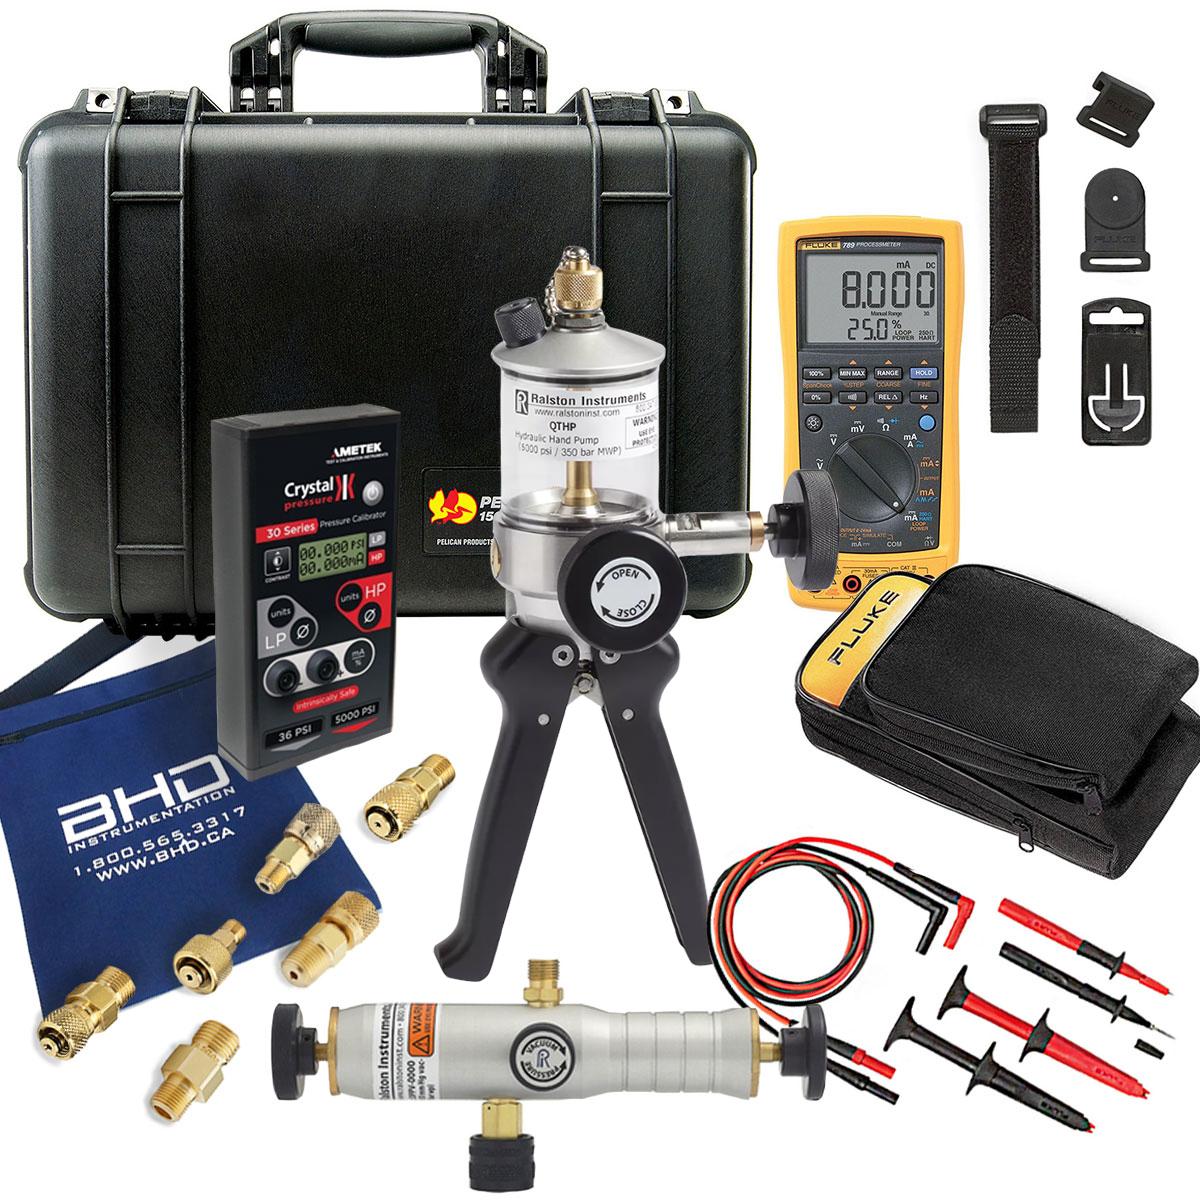 BHD_789-IS33-5K-Kit